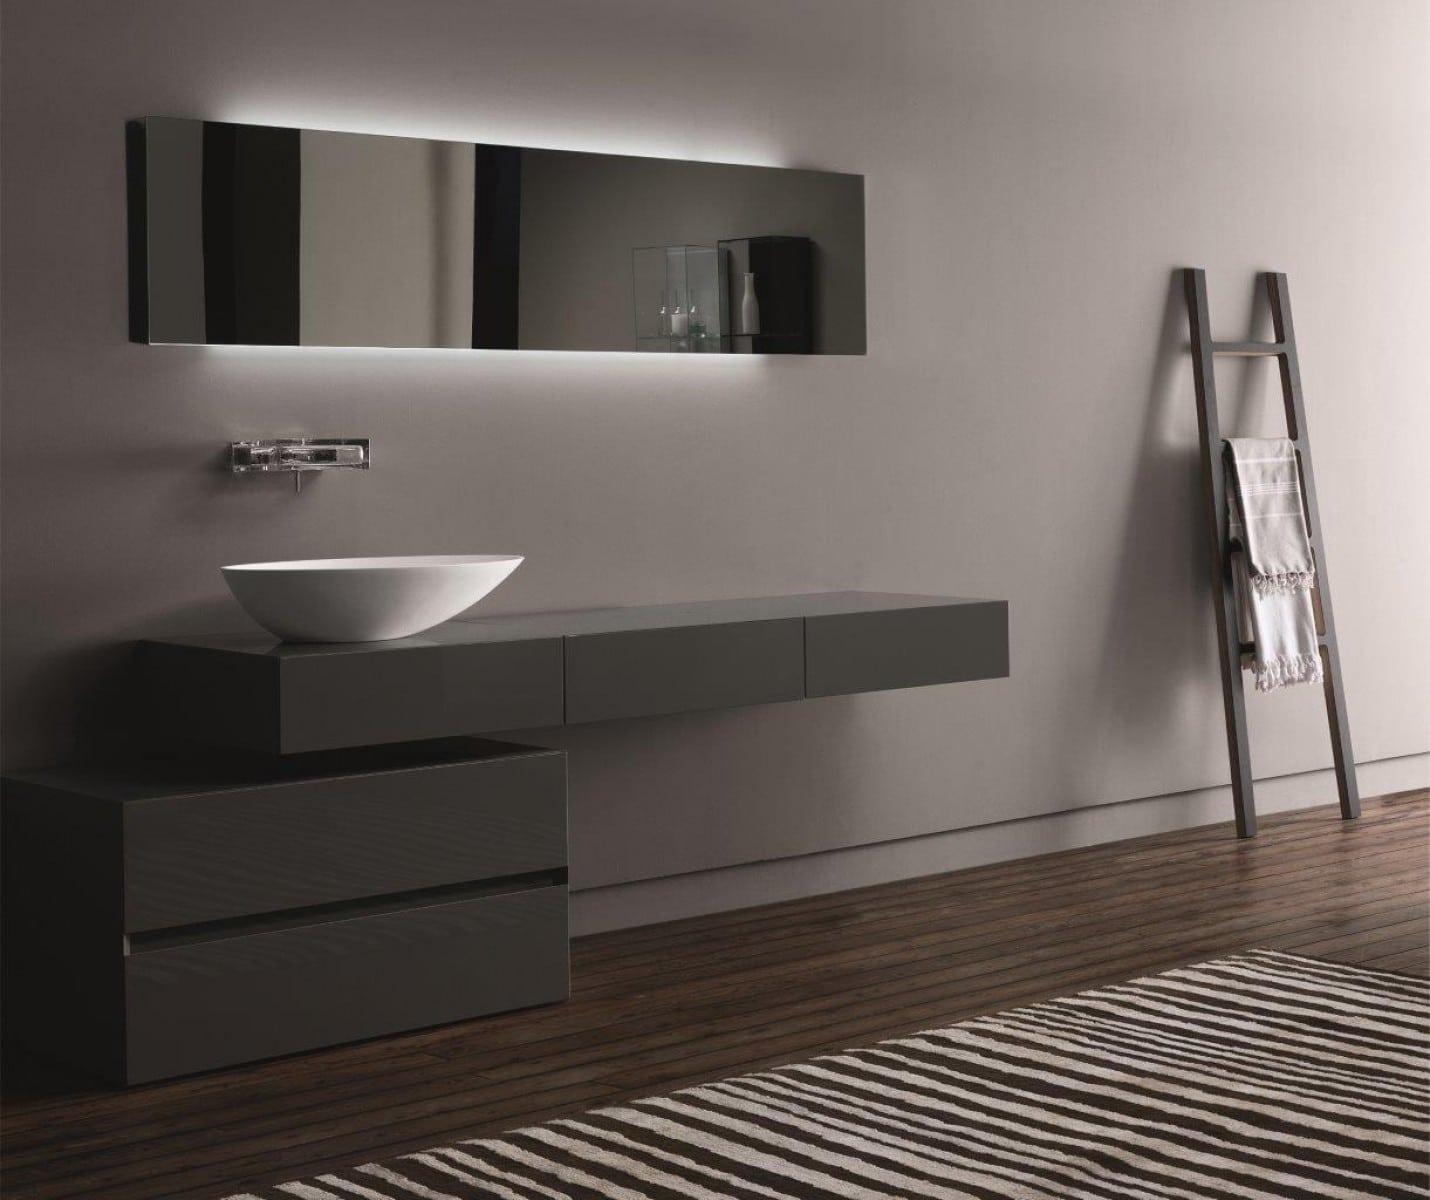 Dise o de cuartos de ba o modernos fotos construye hogar for Habitaciones con azulejos